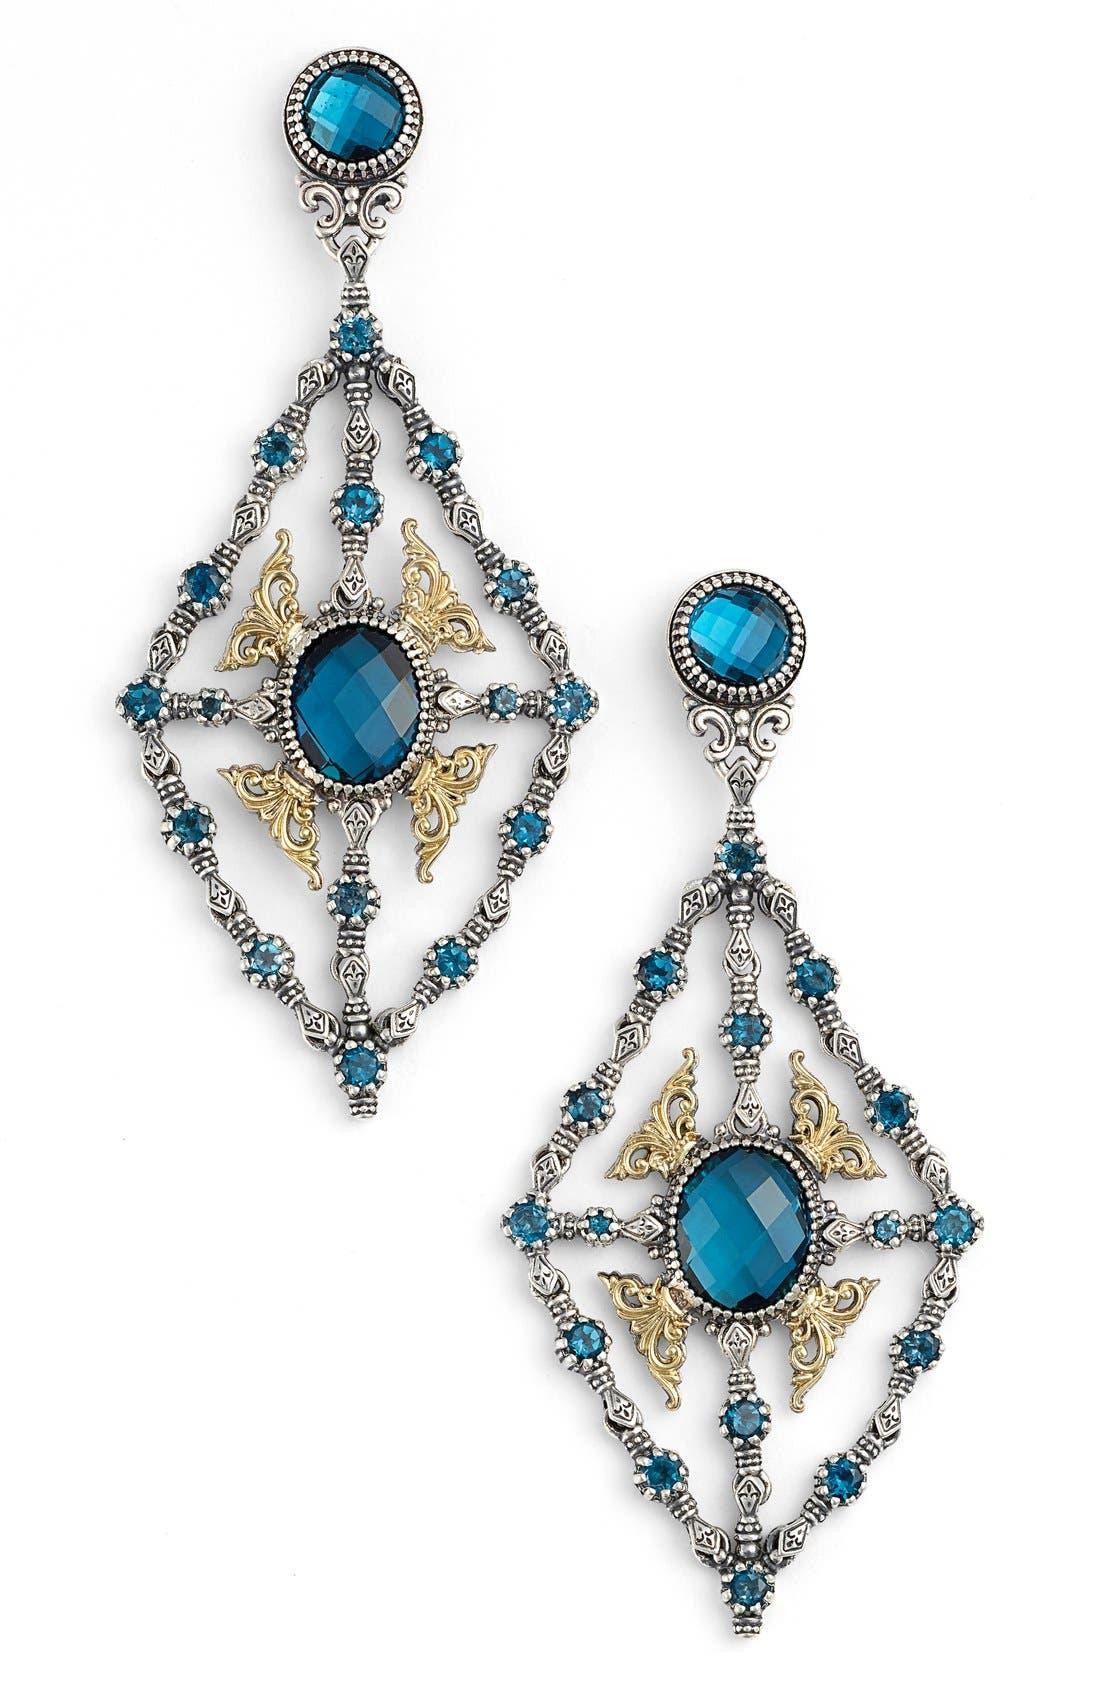 'Thalassa' Blue Topaz Kite Chandelier Earrings,                         Main,                         color, Silver/ London Blue Topaz